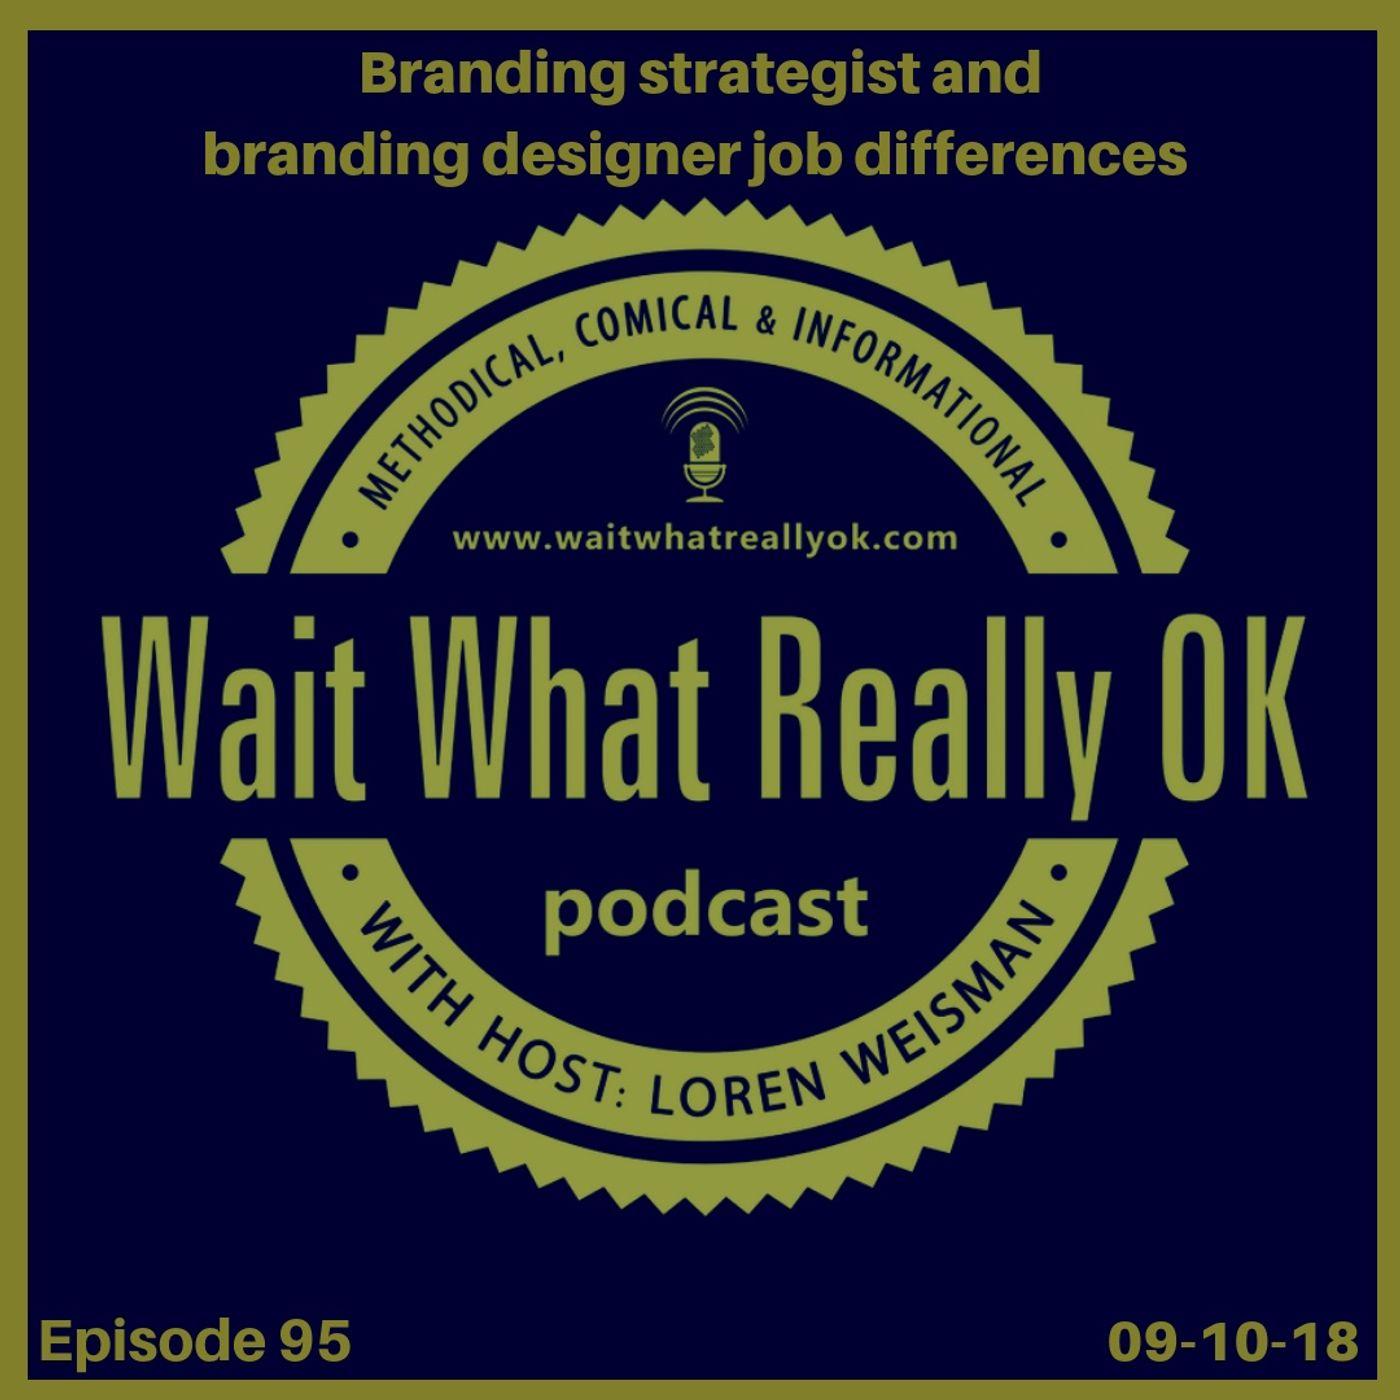 Brand Messaging Strategist and branding designer job differences.